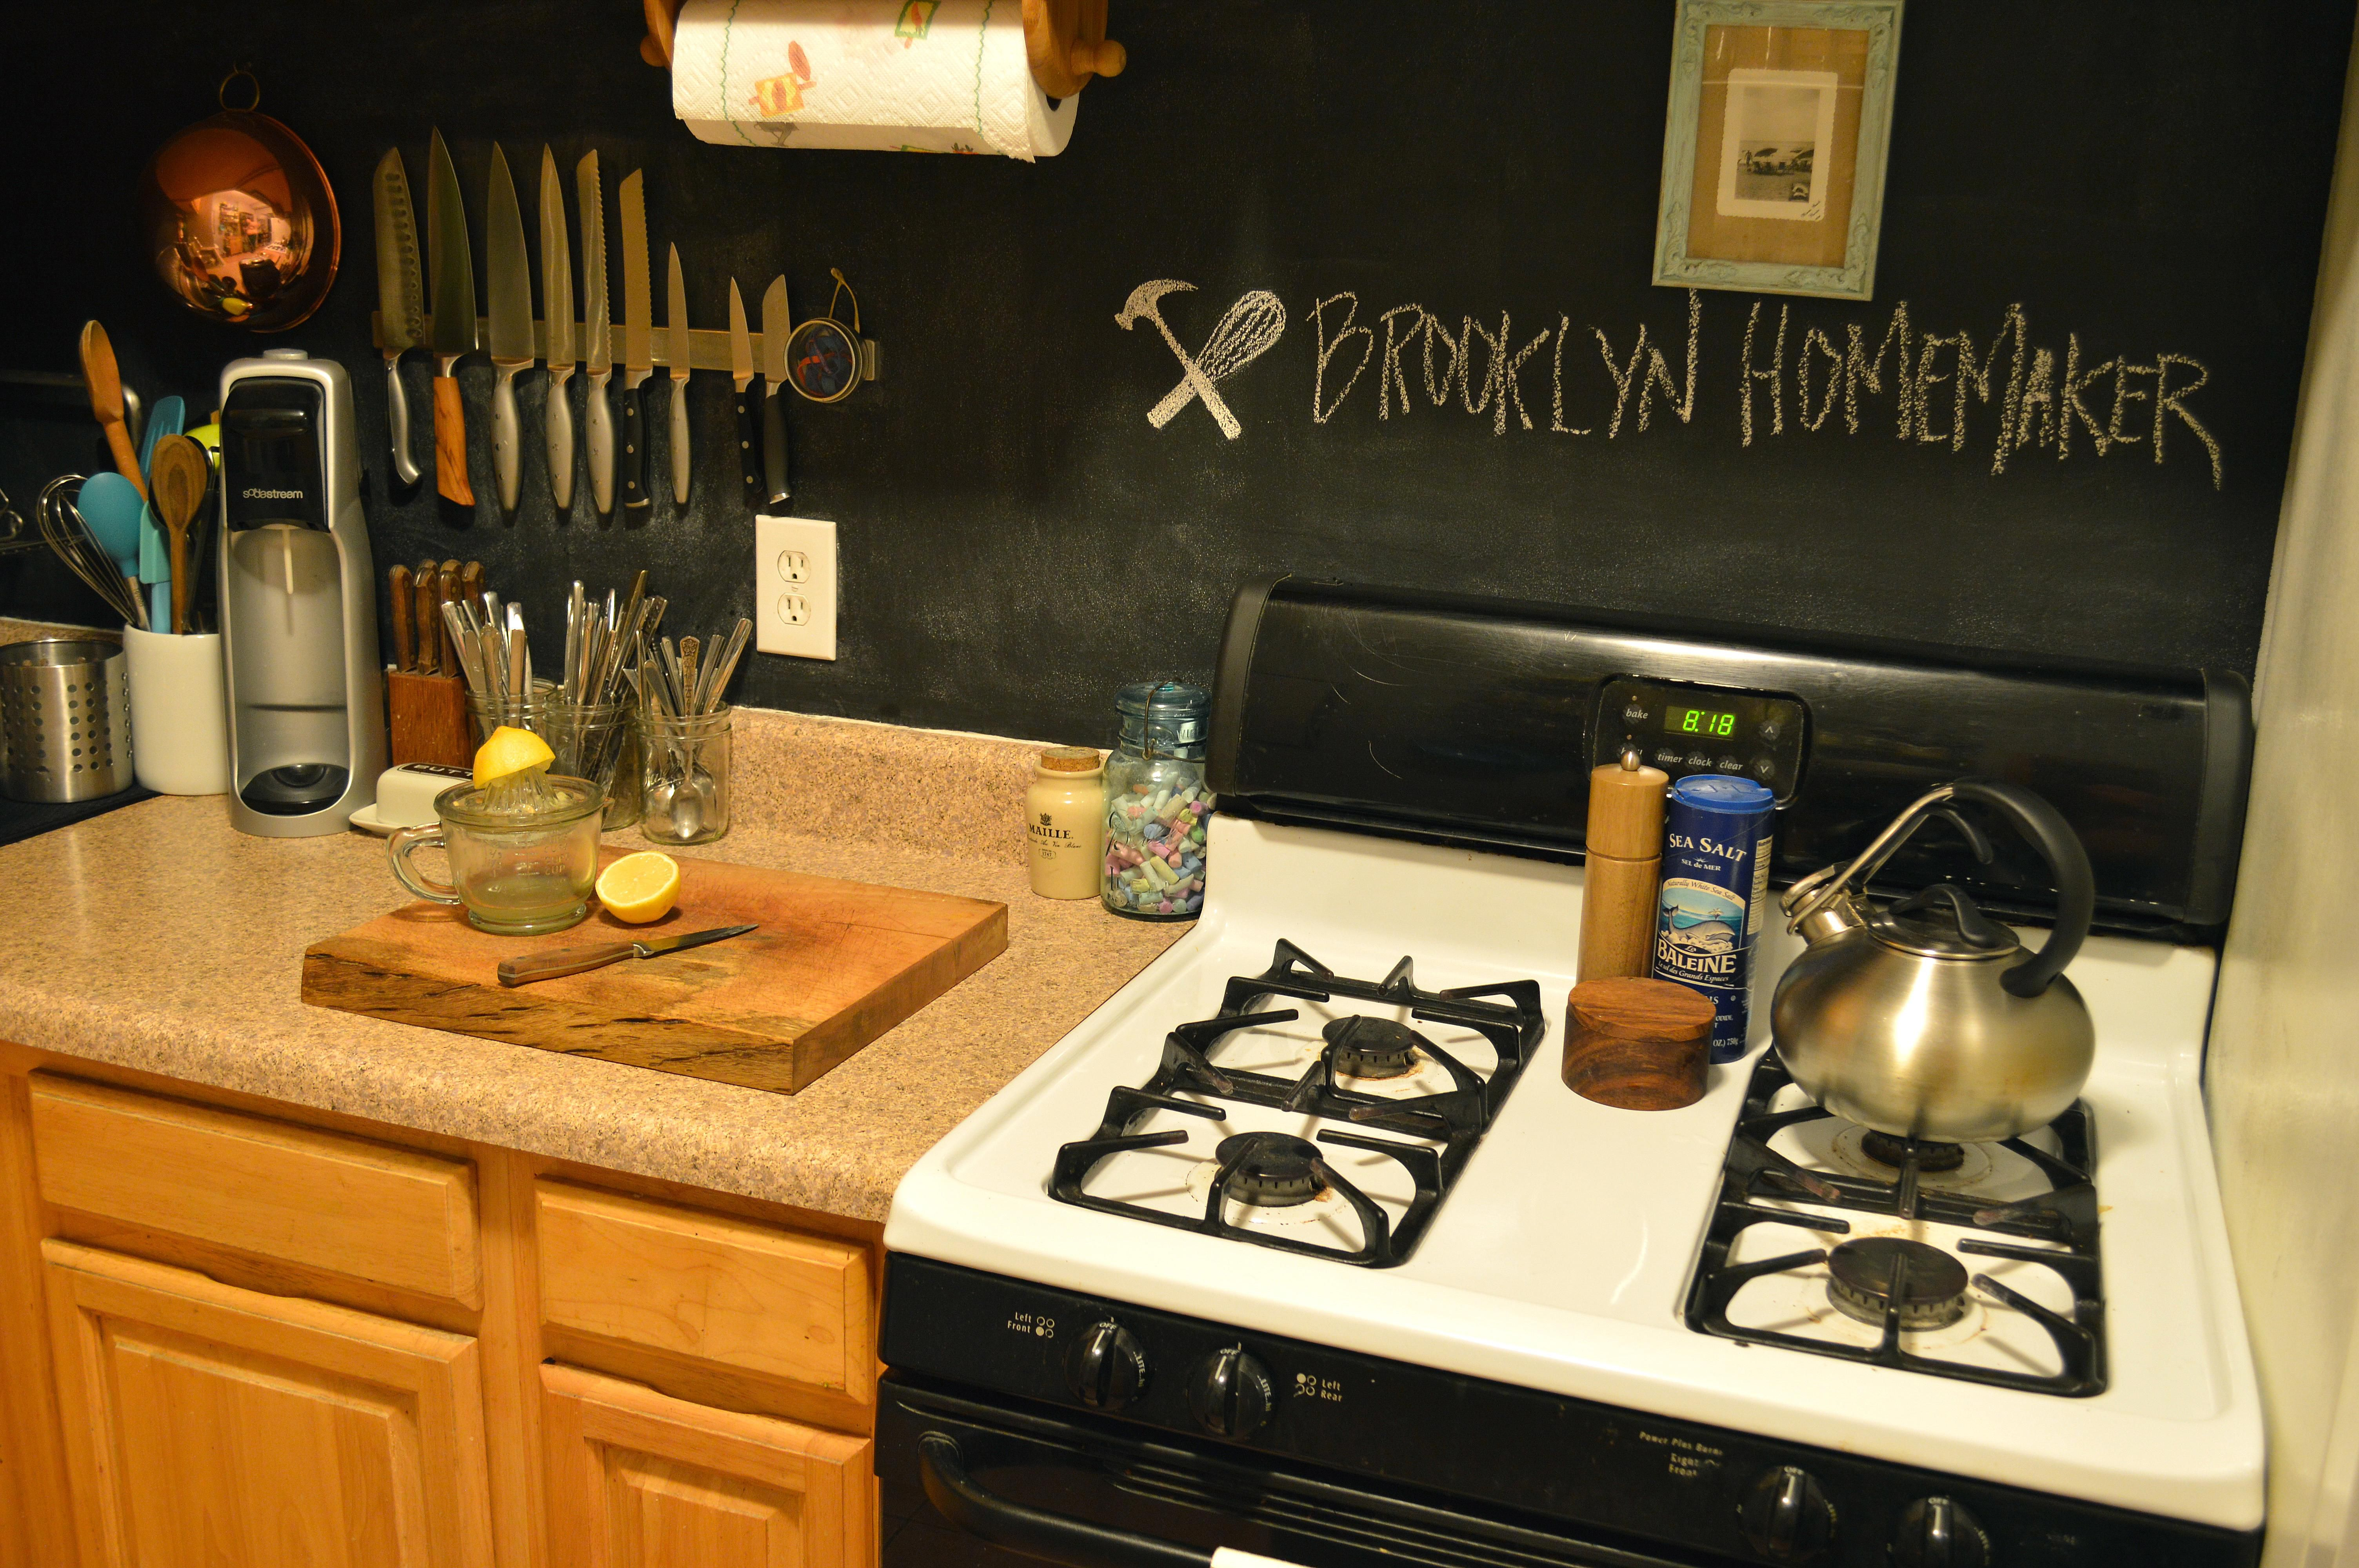 Chalkboard Kitchen Backsplash | 13 Removable Kitchen Backsplash Ideas